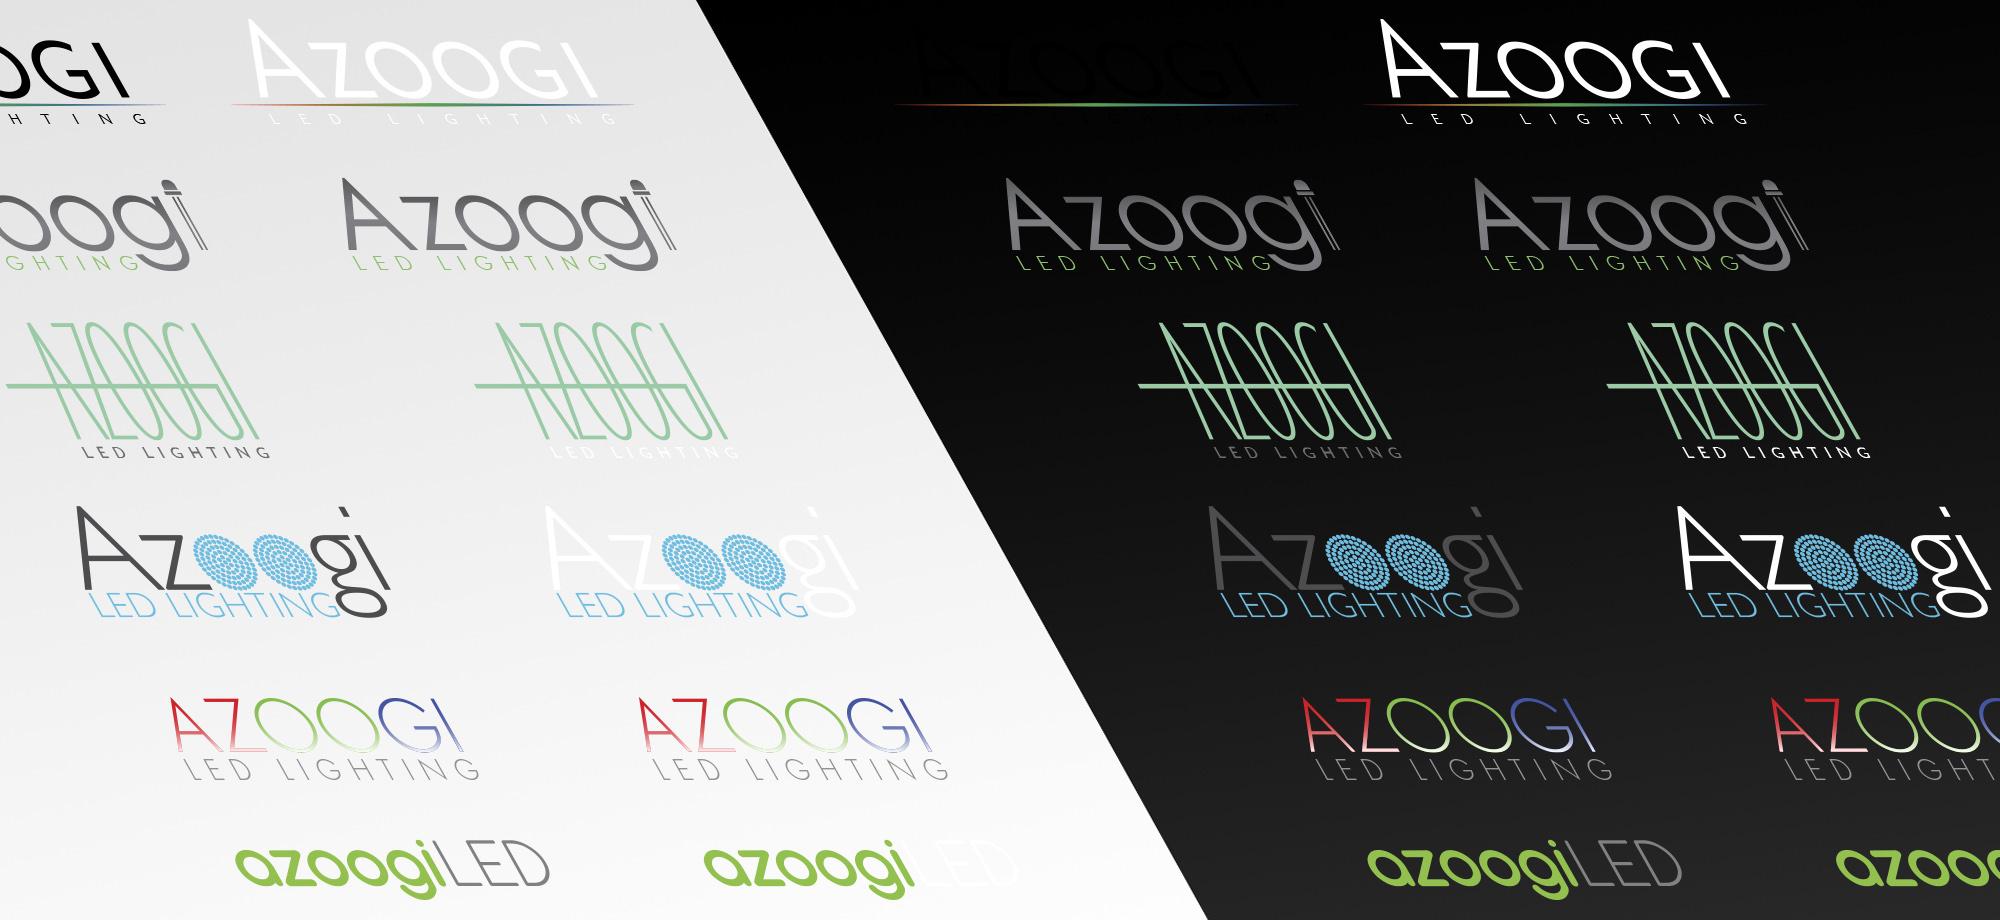 Azoogi concepts.jpg